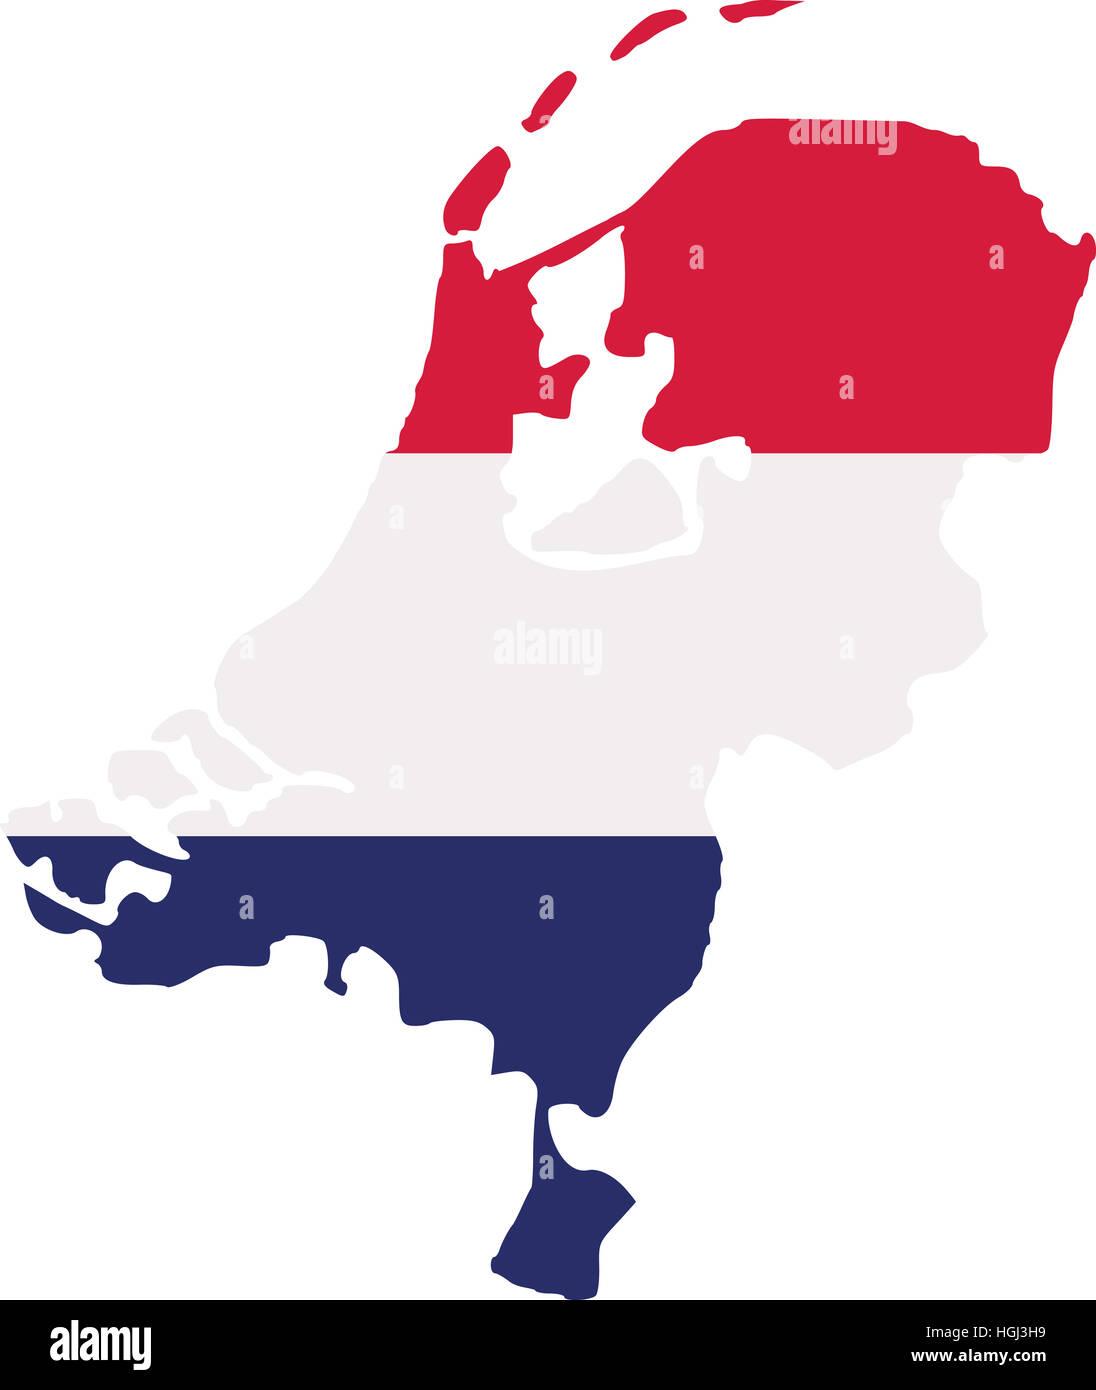 Netherlands map Stock Photo Royalty Free Image 130705045 Alamy